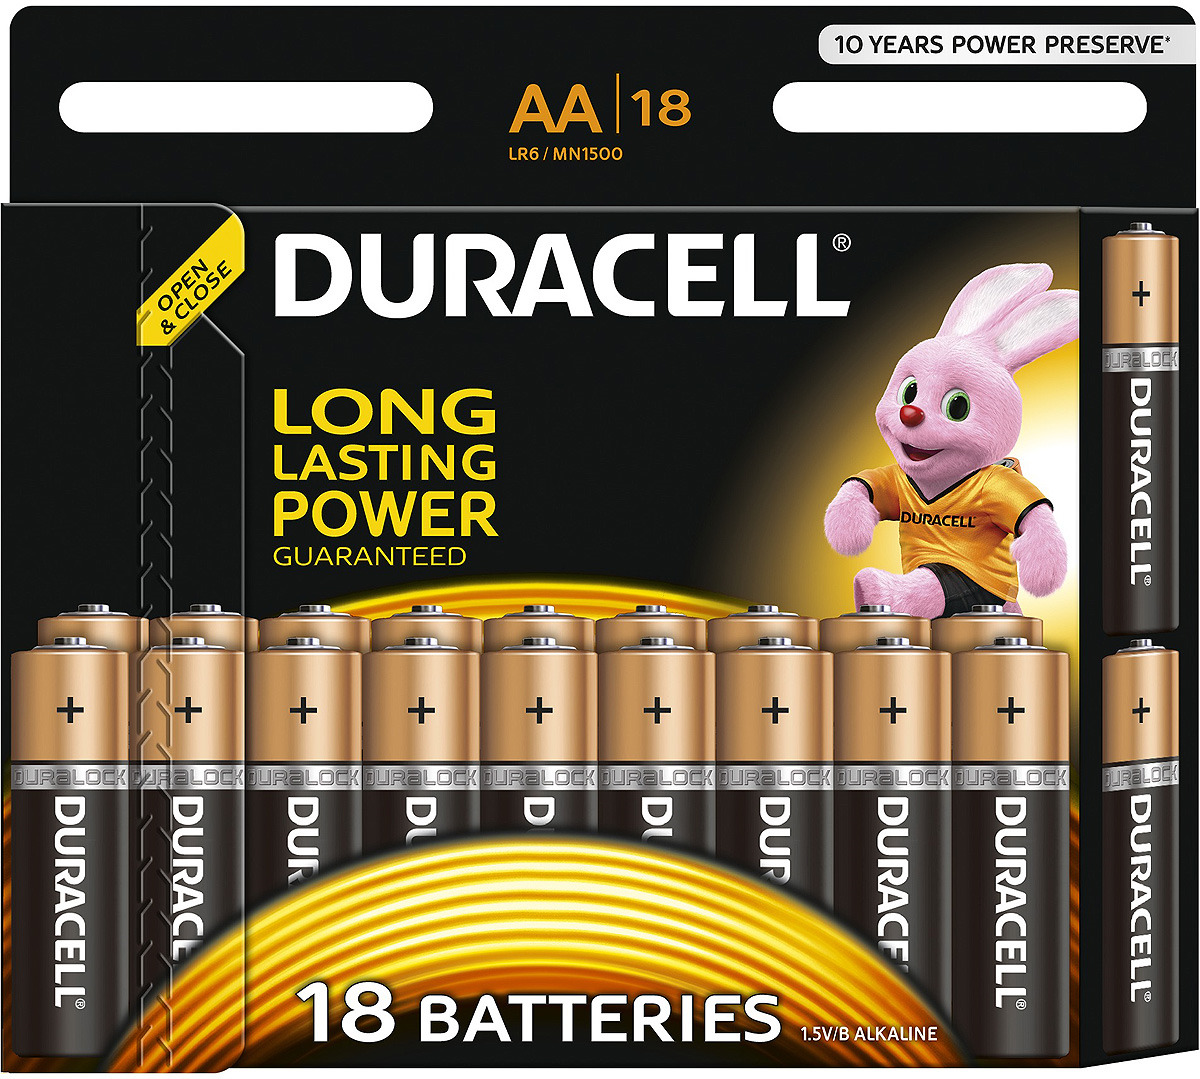 Набор щелочных батареек Duracell Basic, тип АА, 18 шт батарейки duracell аа lr6 2bl basic cn 2 шт